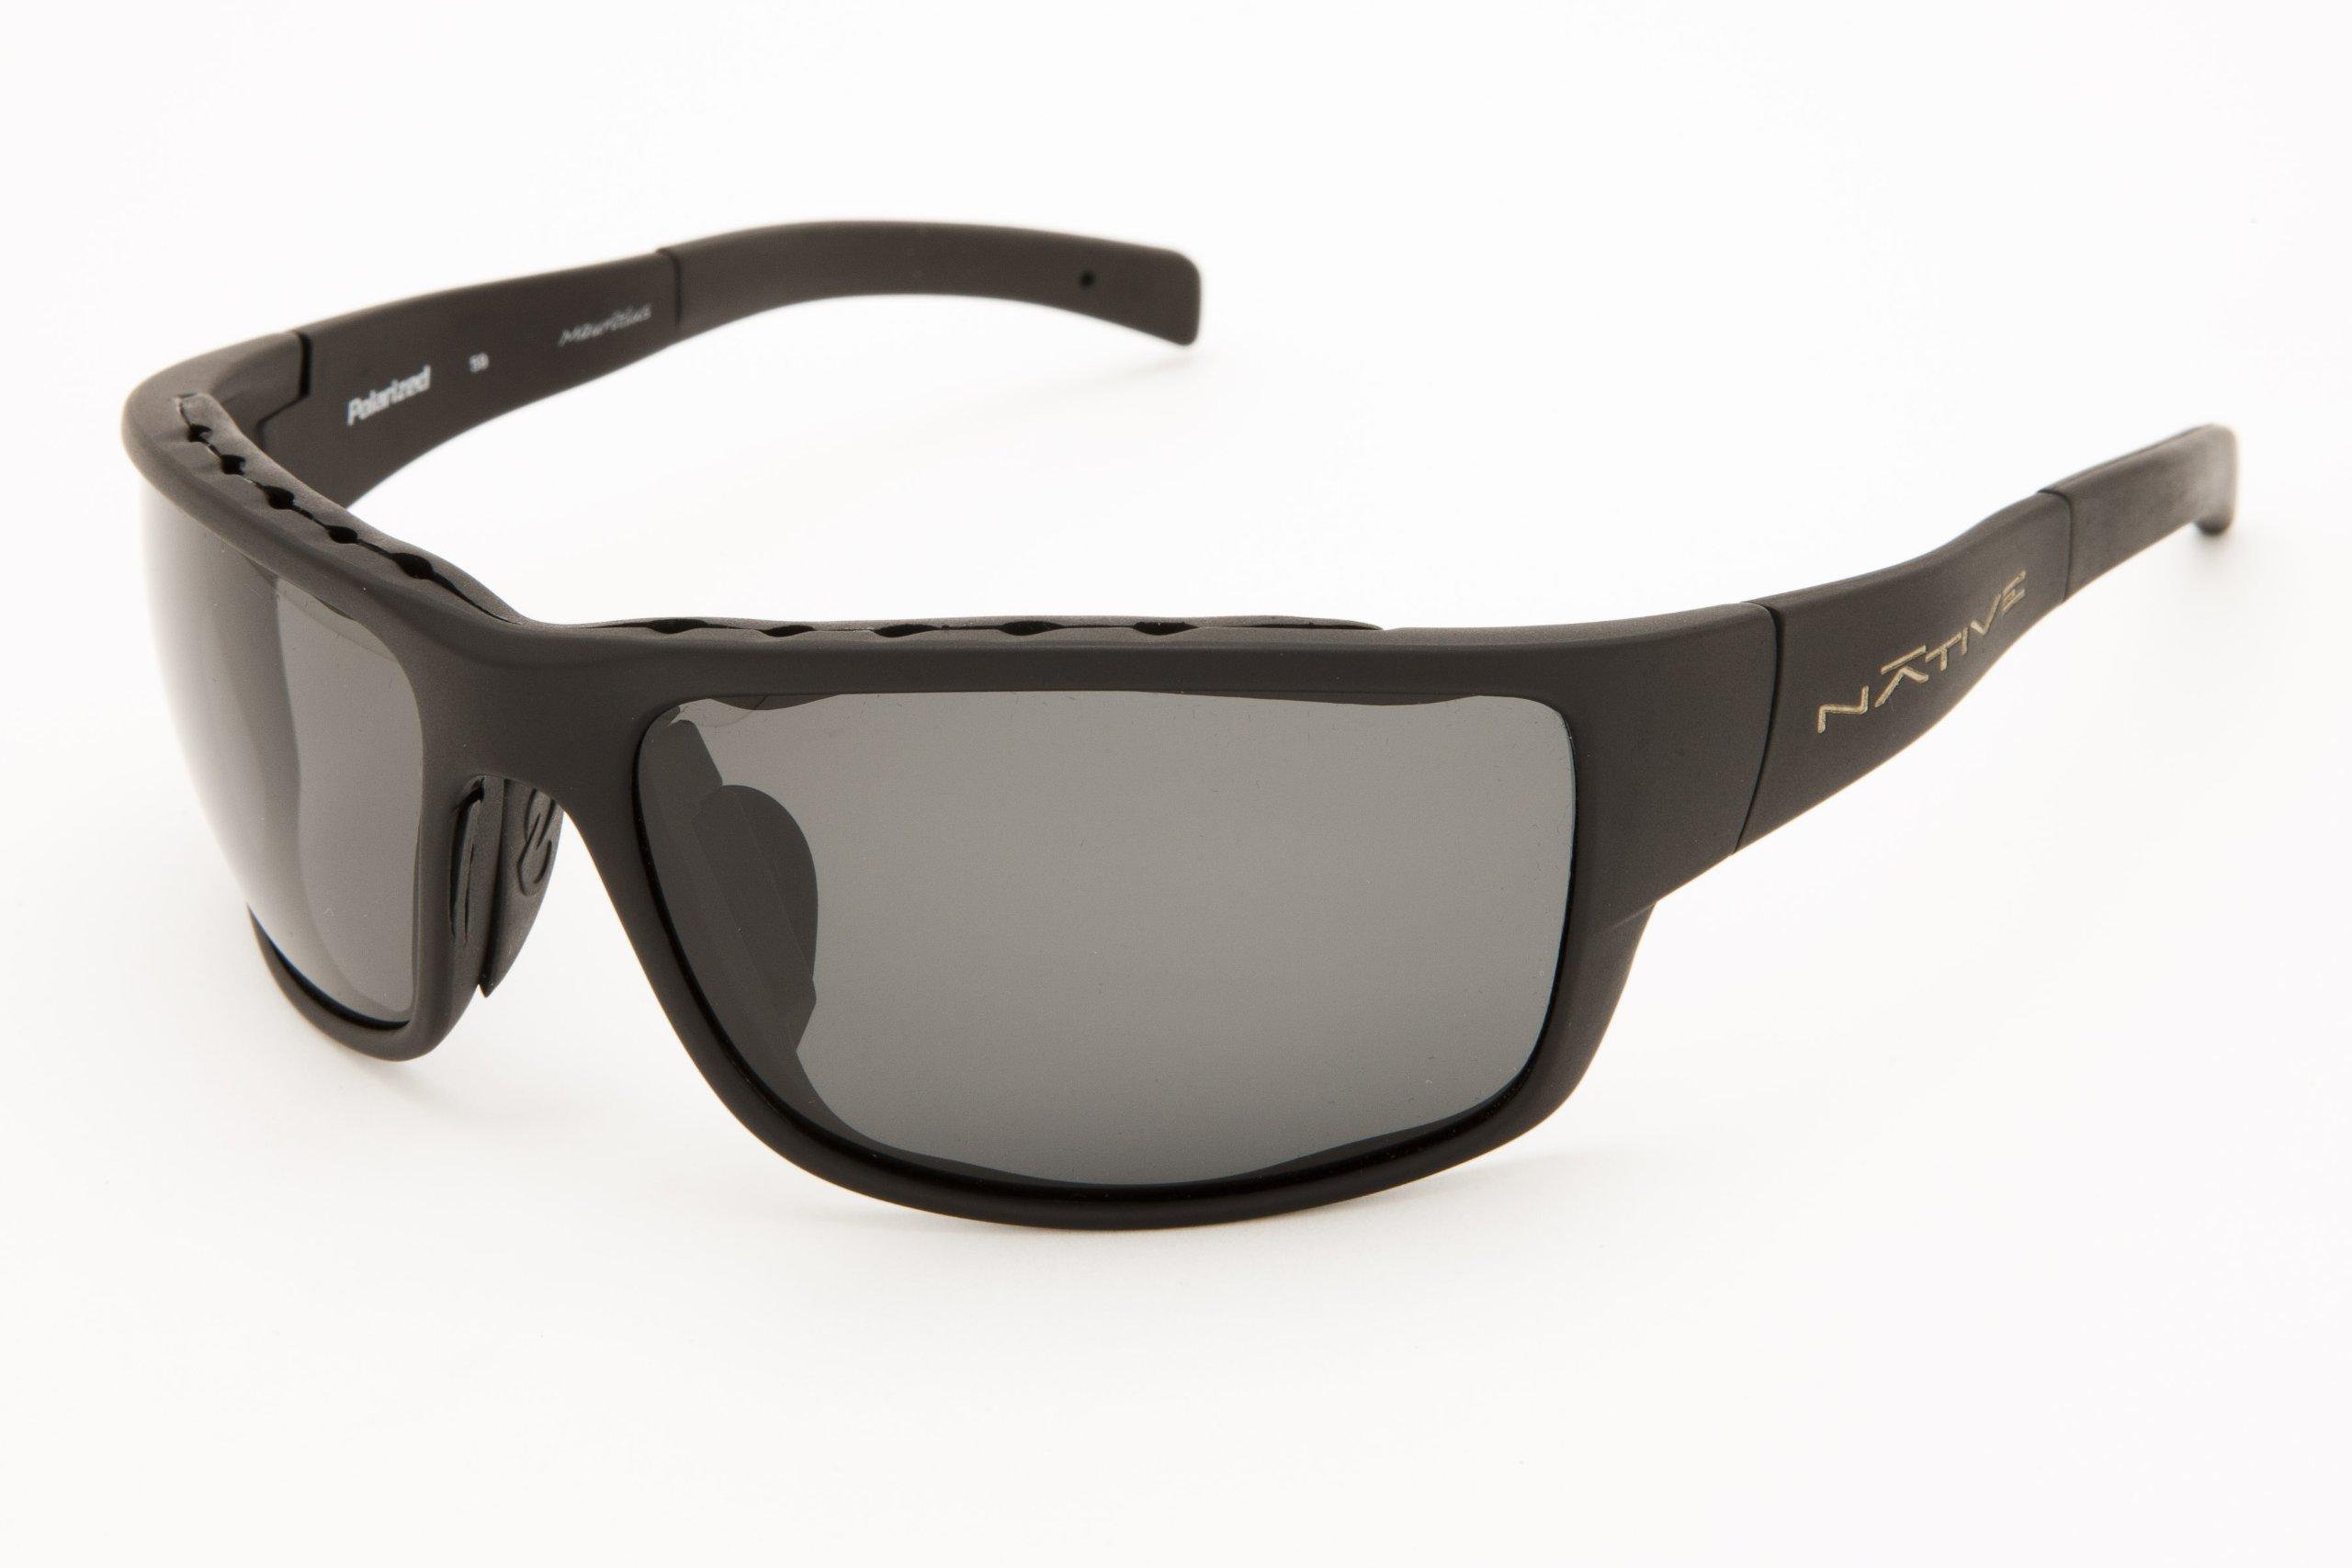 Native Eyewear Cable Sunglasses, Asphalt with Gray Lens